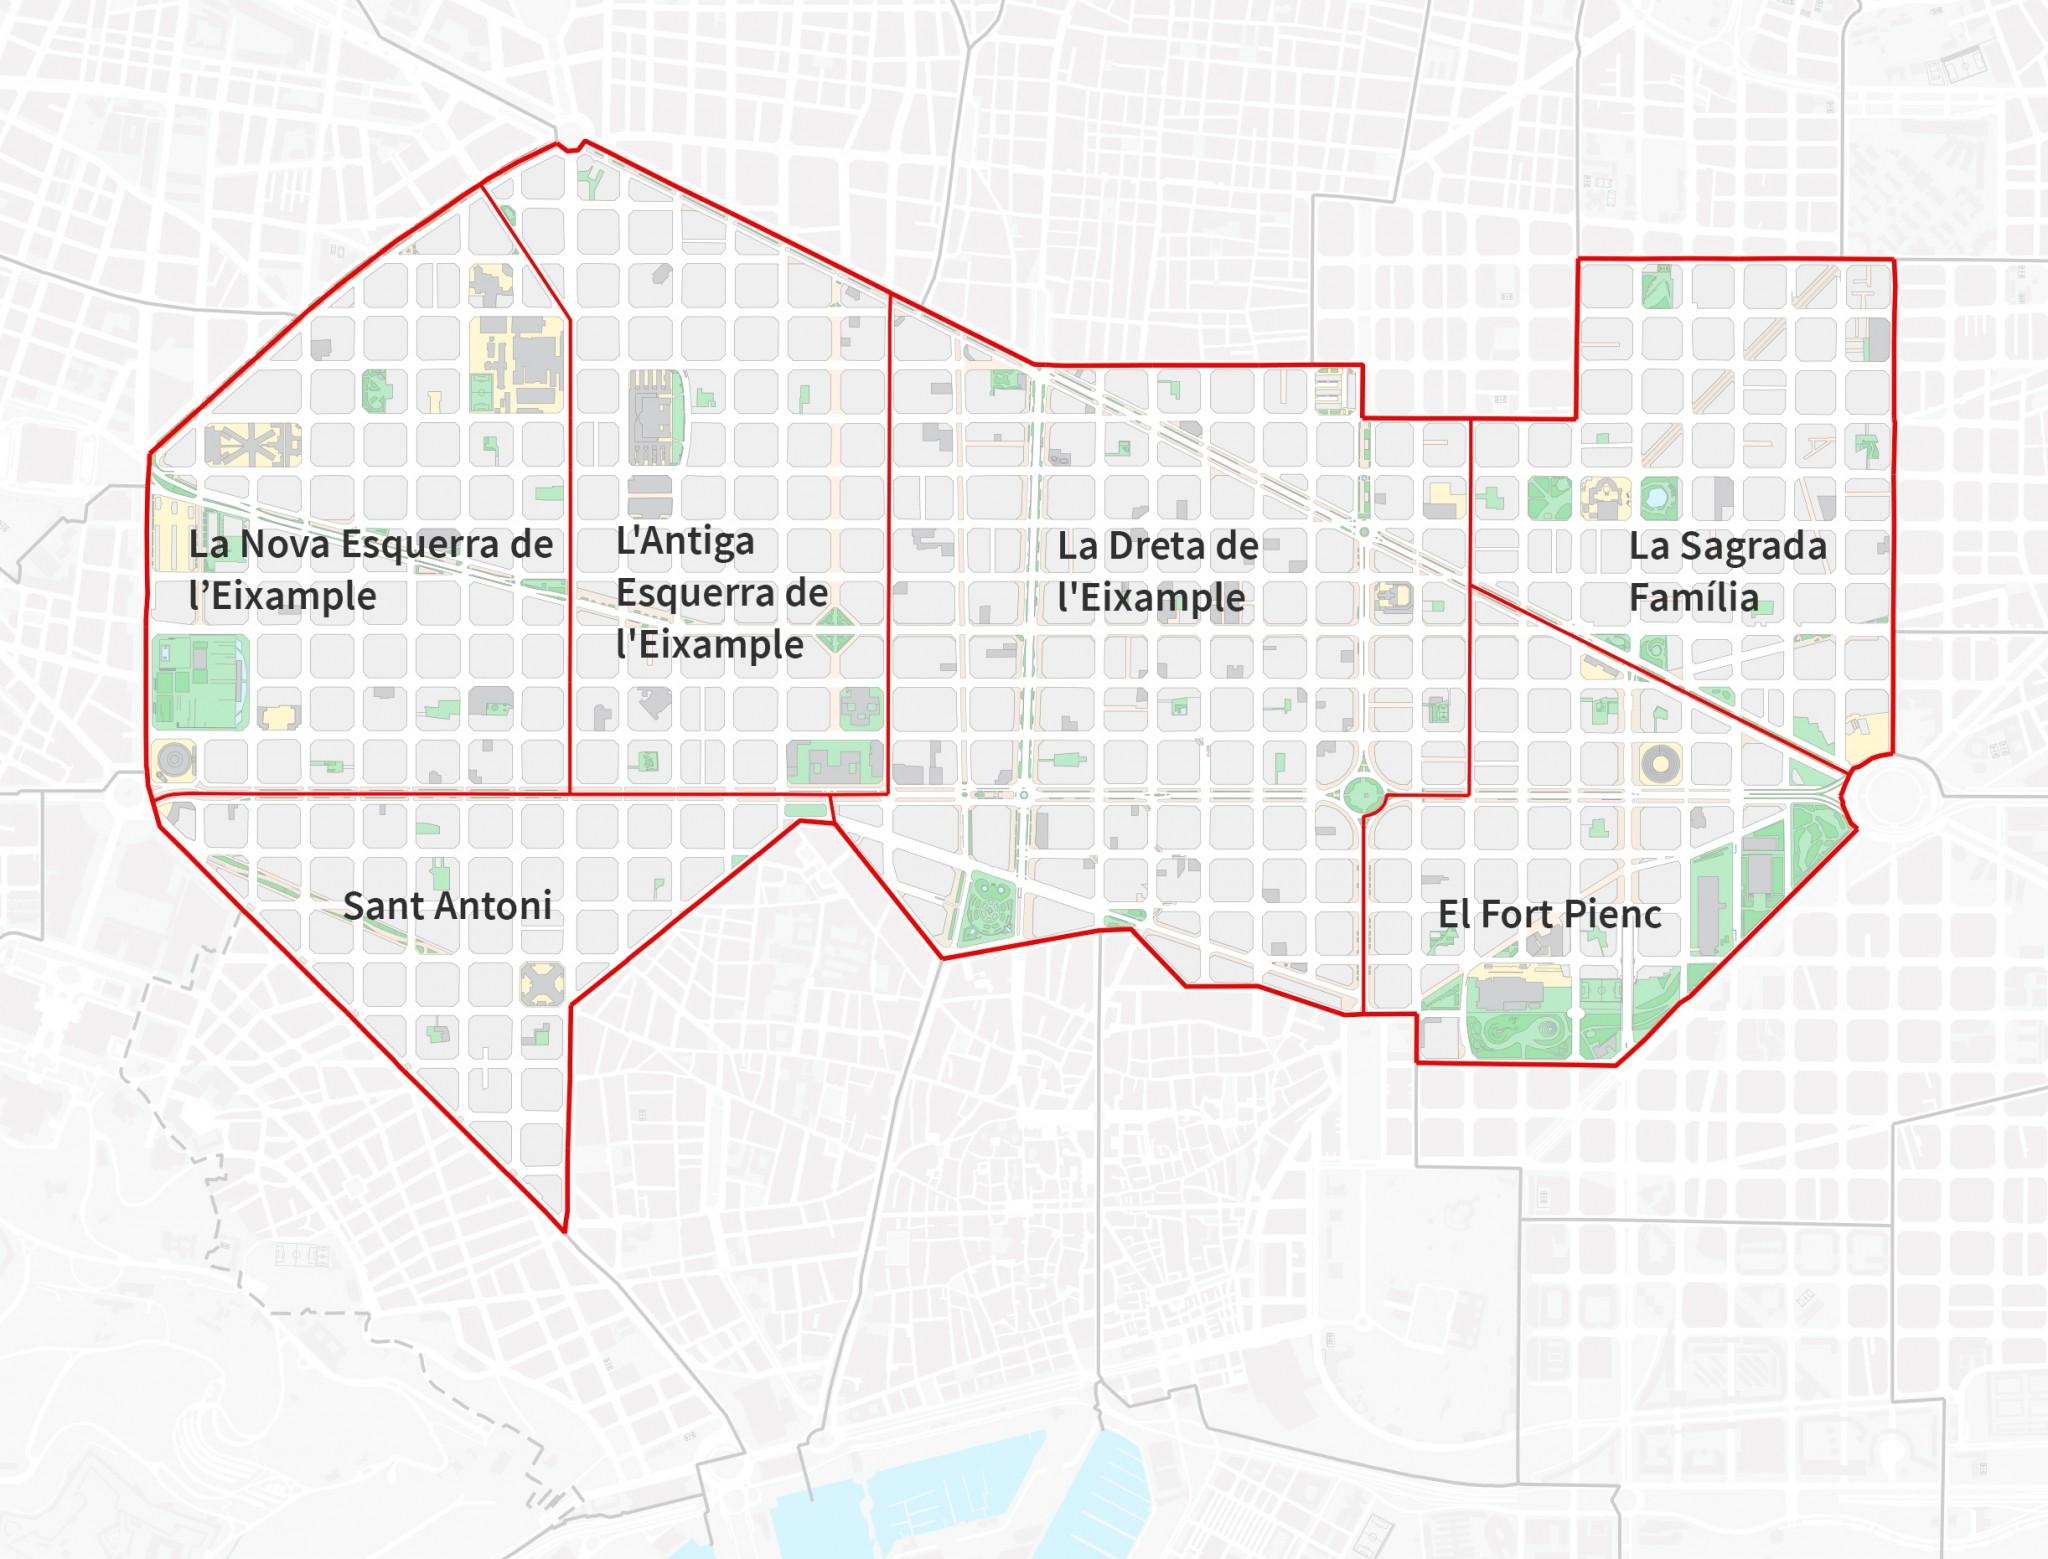 Eixample Dreta Barcelona Mapa.De Paseo Por El Eixample De Barcelona